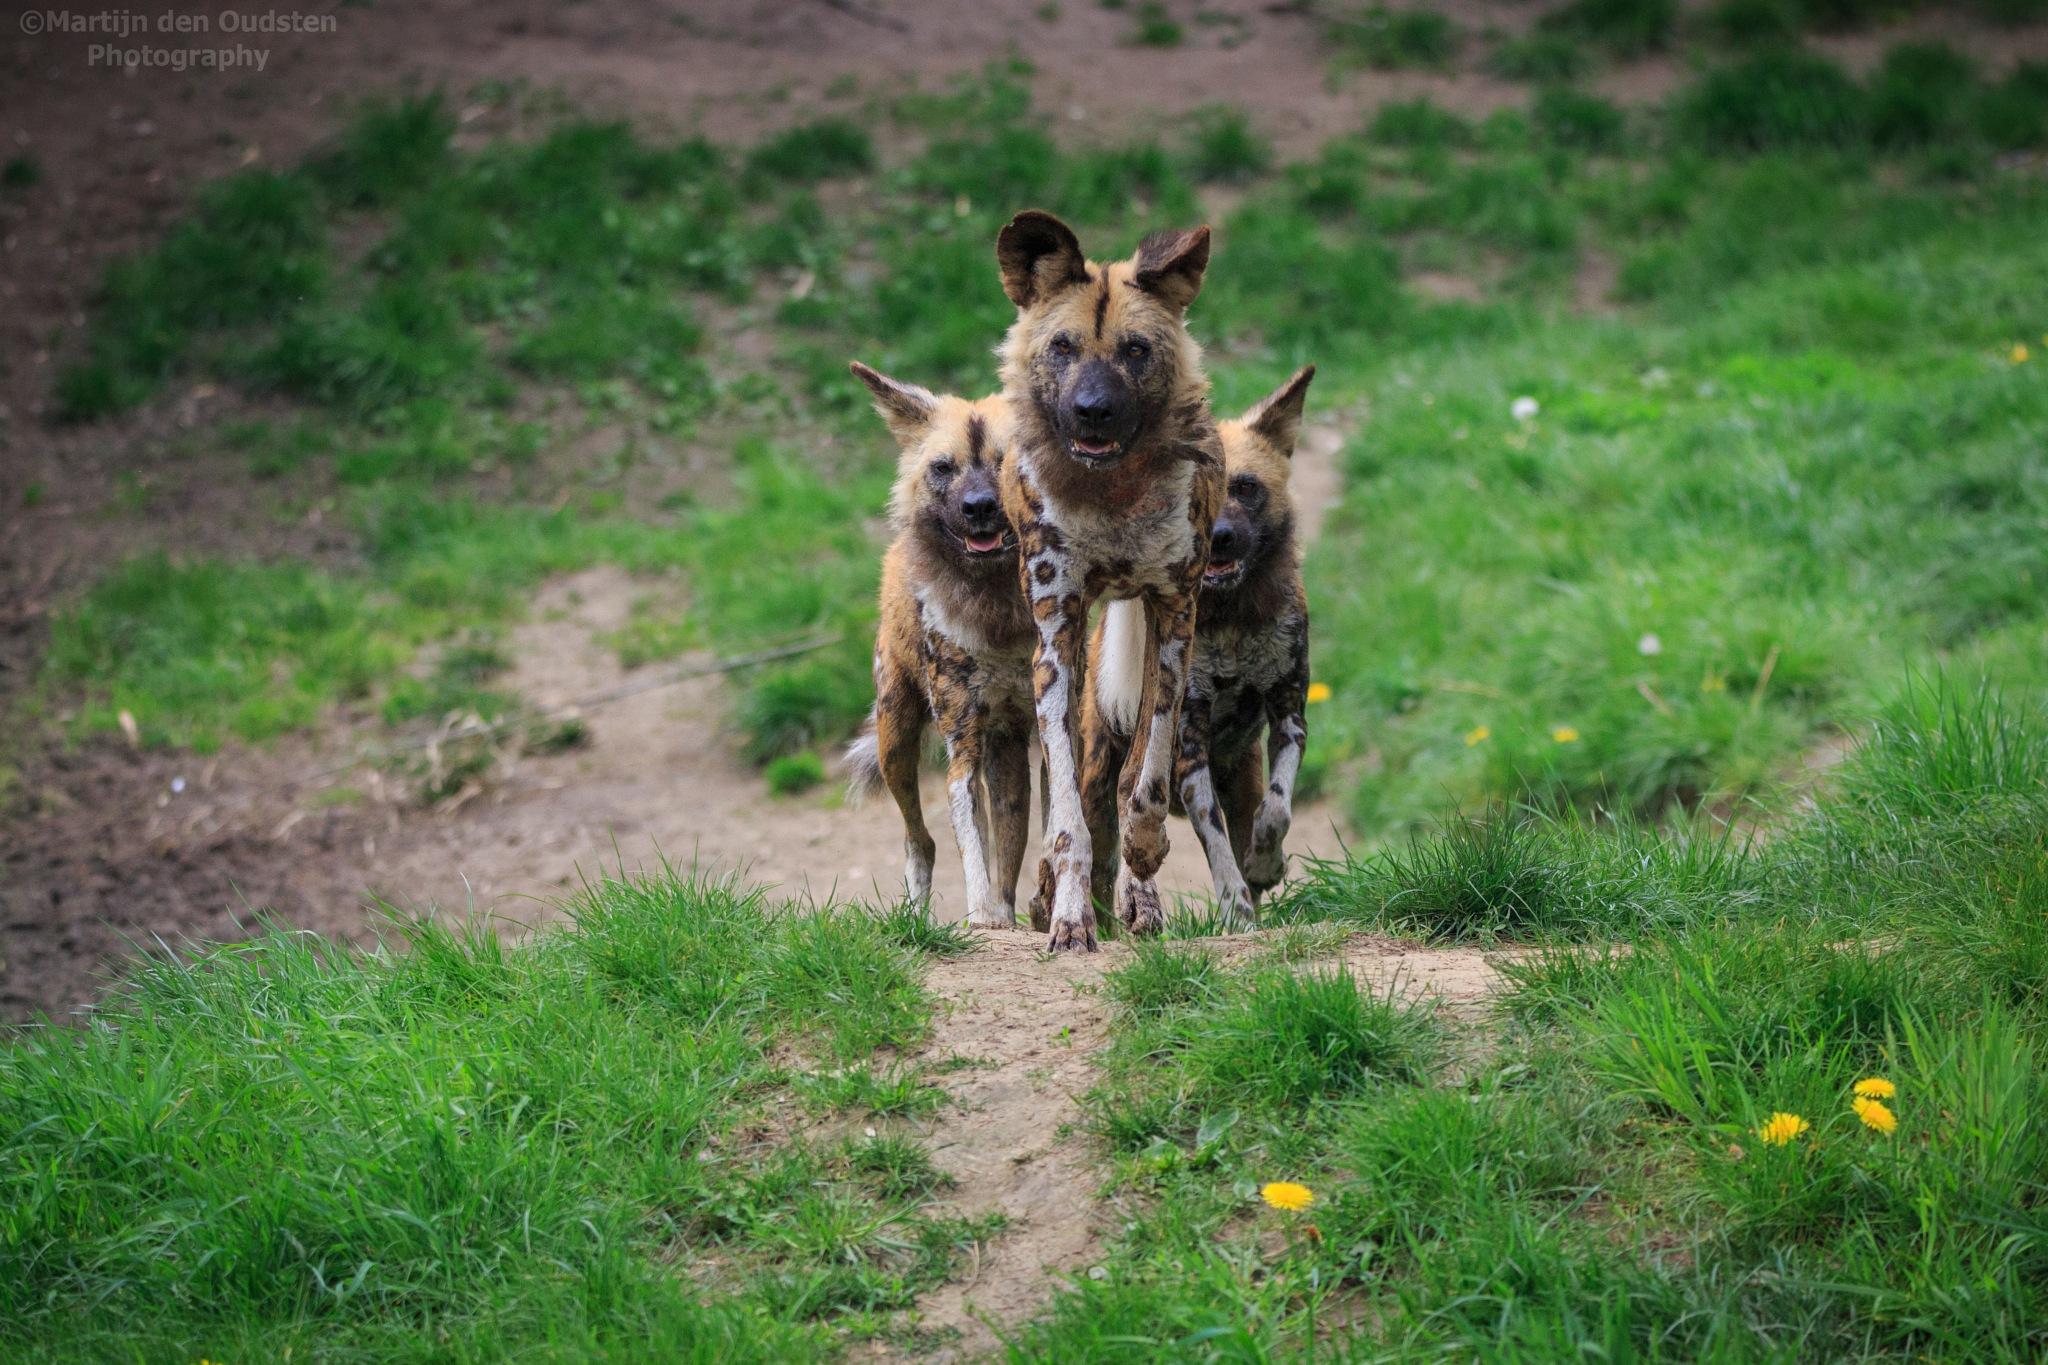 African wild dogs by Martijn Den Oudsten